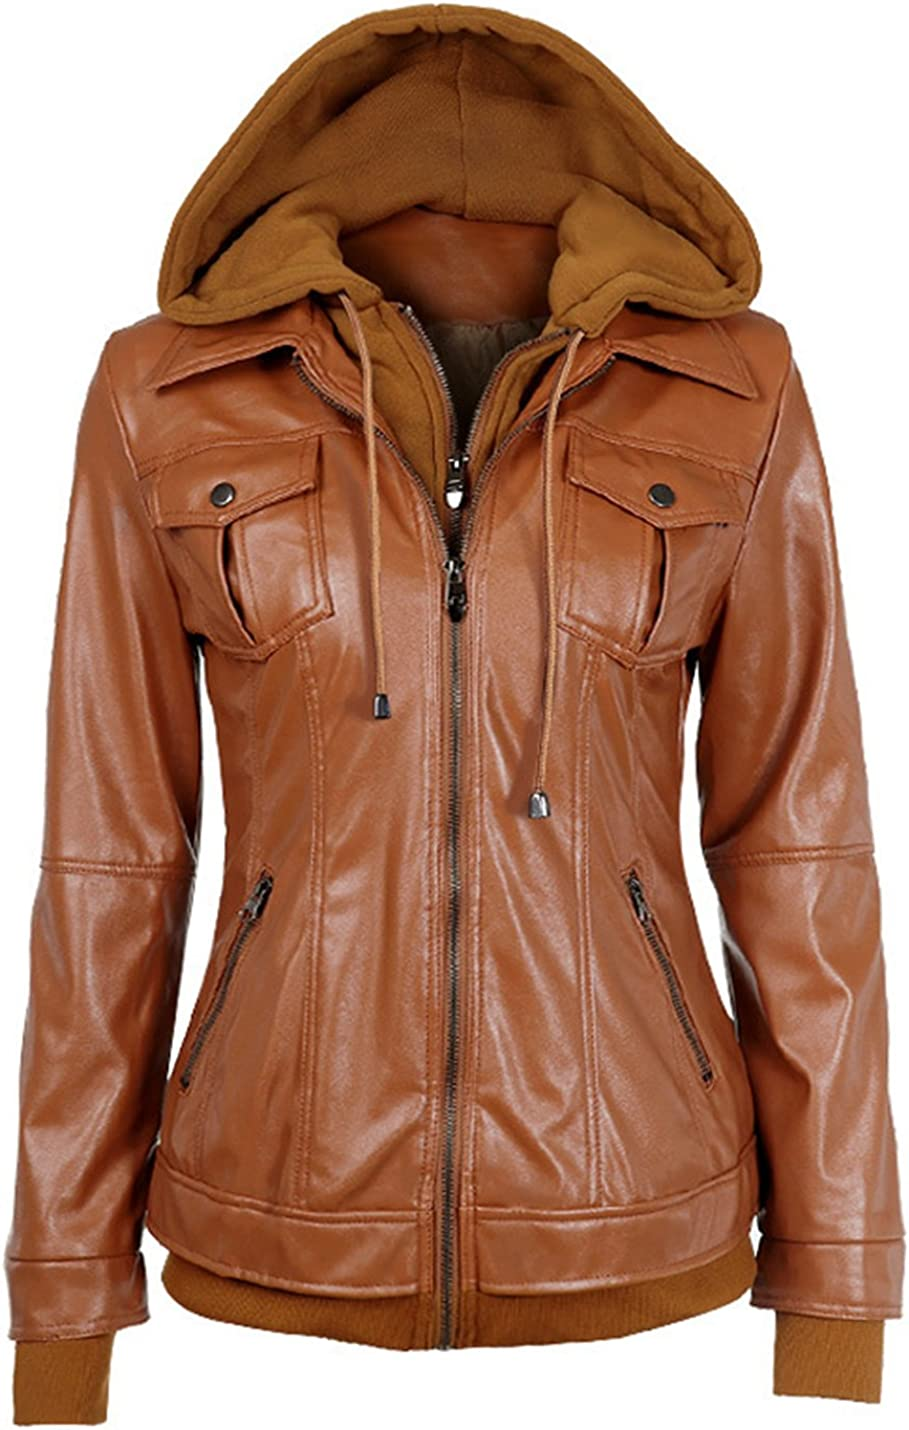 Lentta Women's Casual Zip Solid Color Faux Leather Moto Biker Jacket with Hood